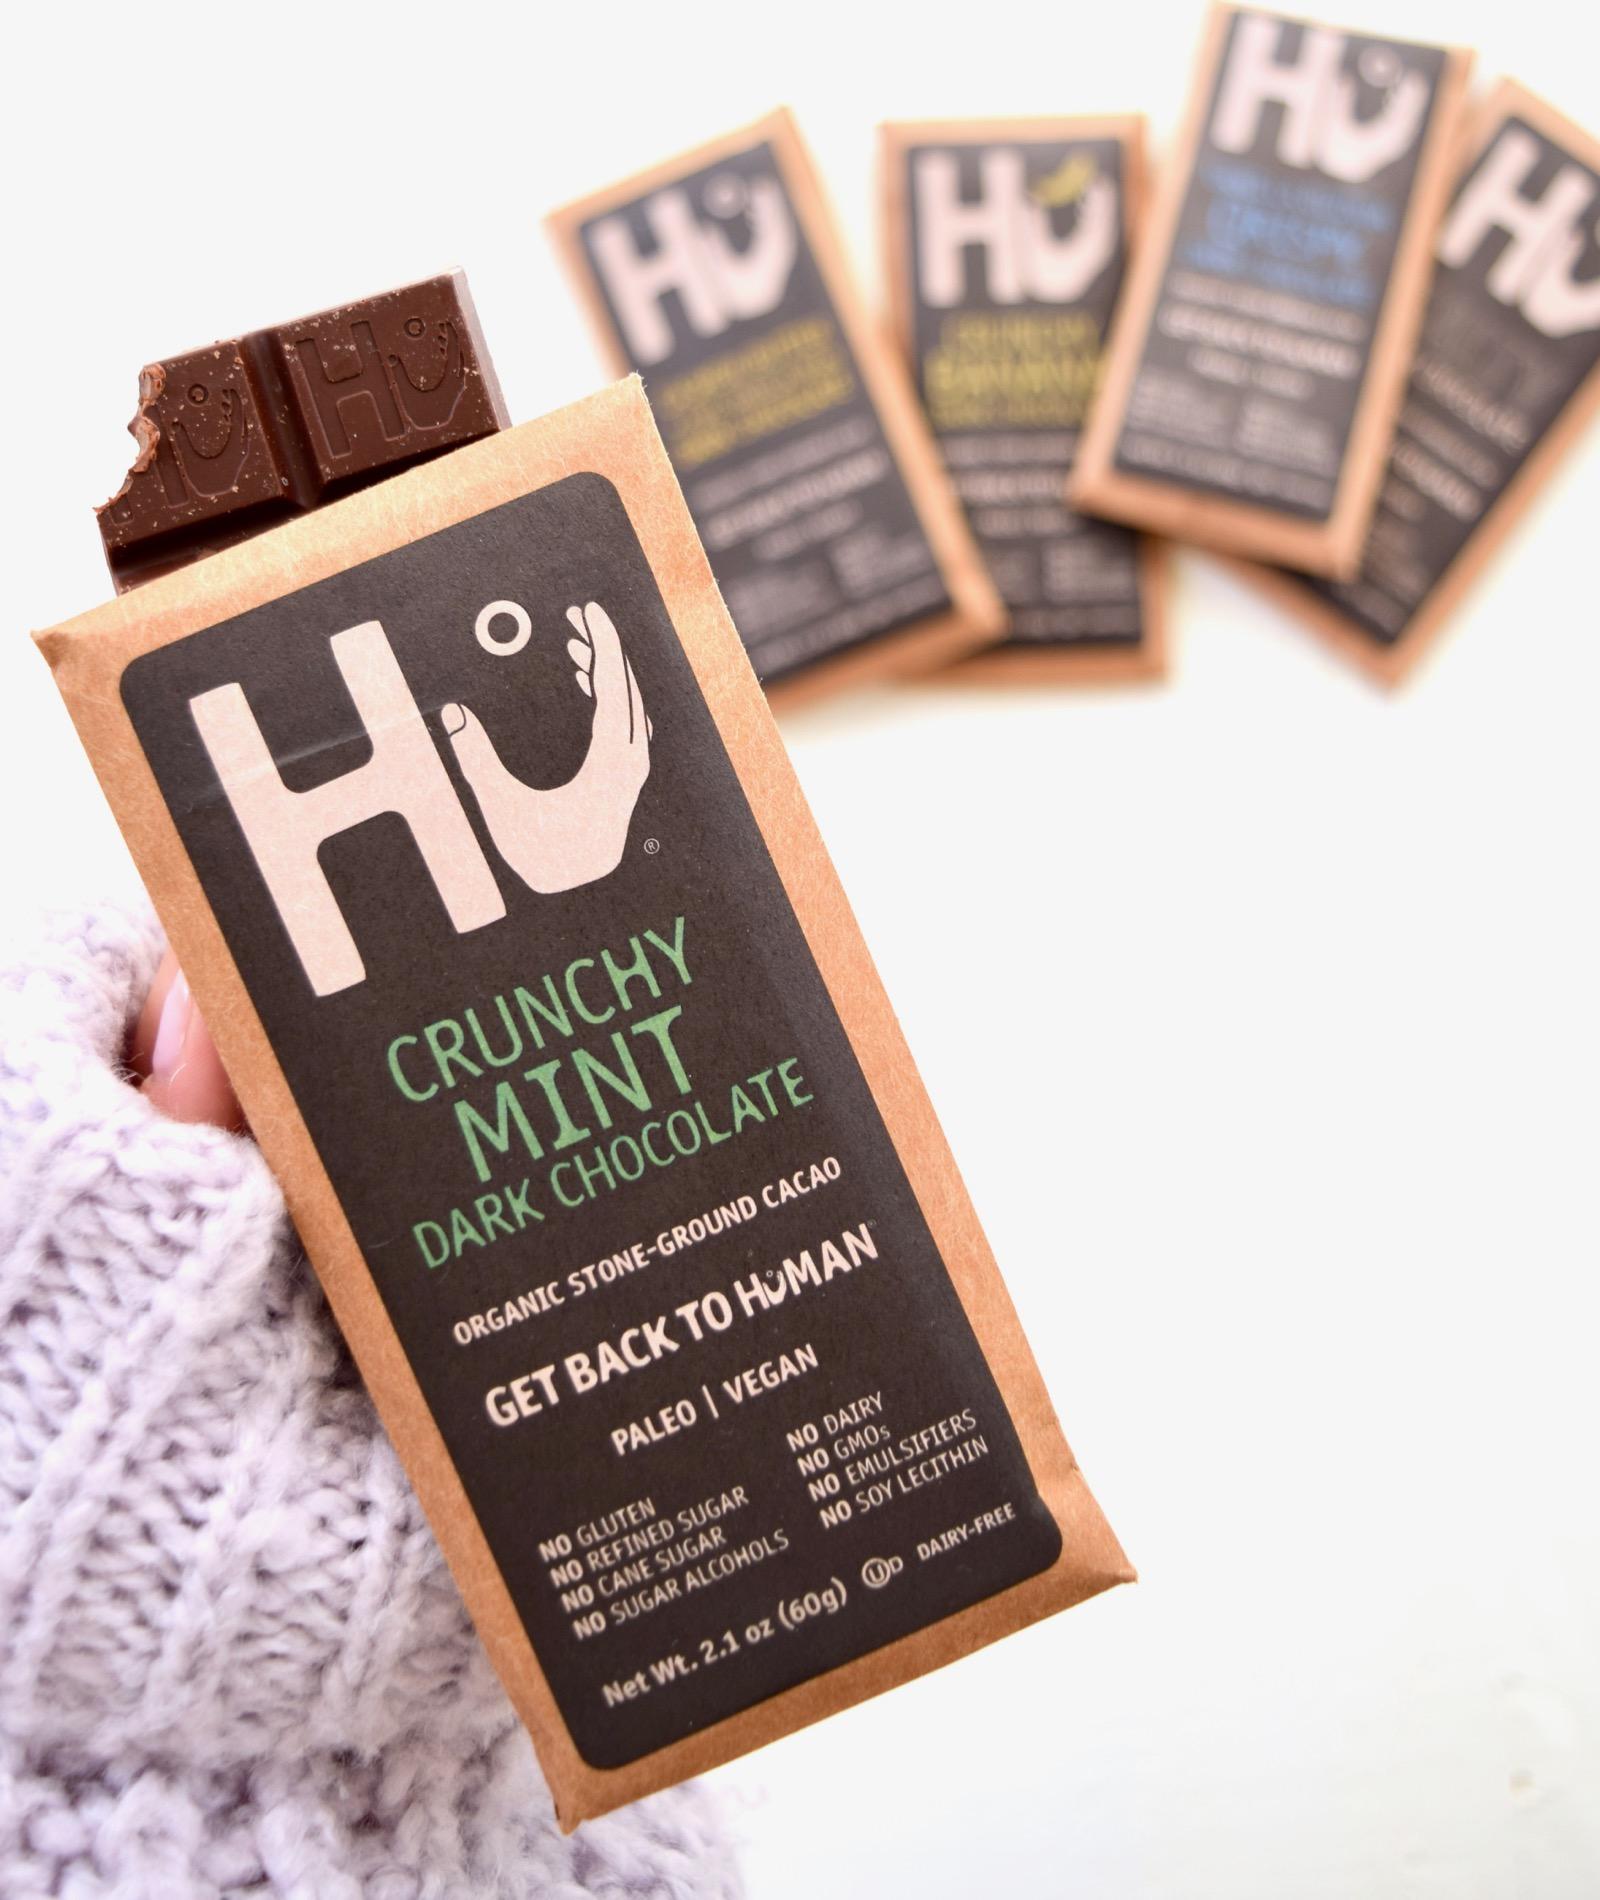 Hu Kitchen Chocolate Bar Review